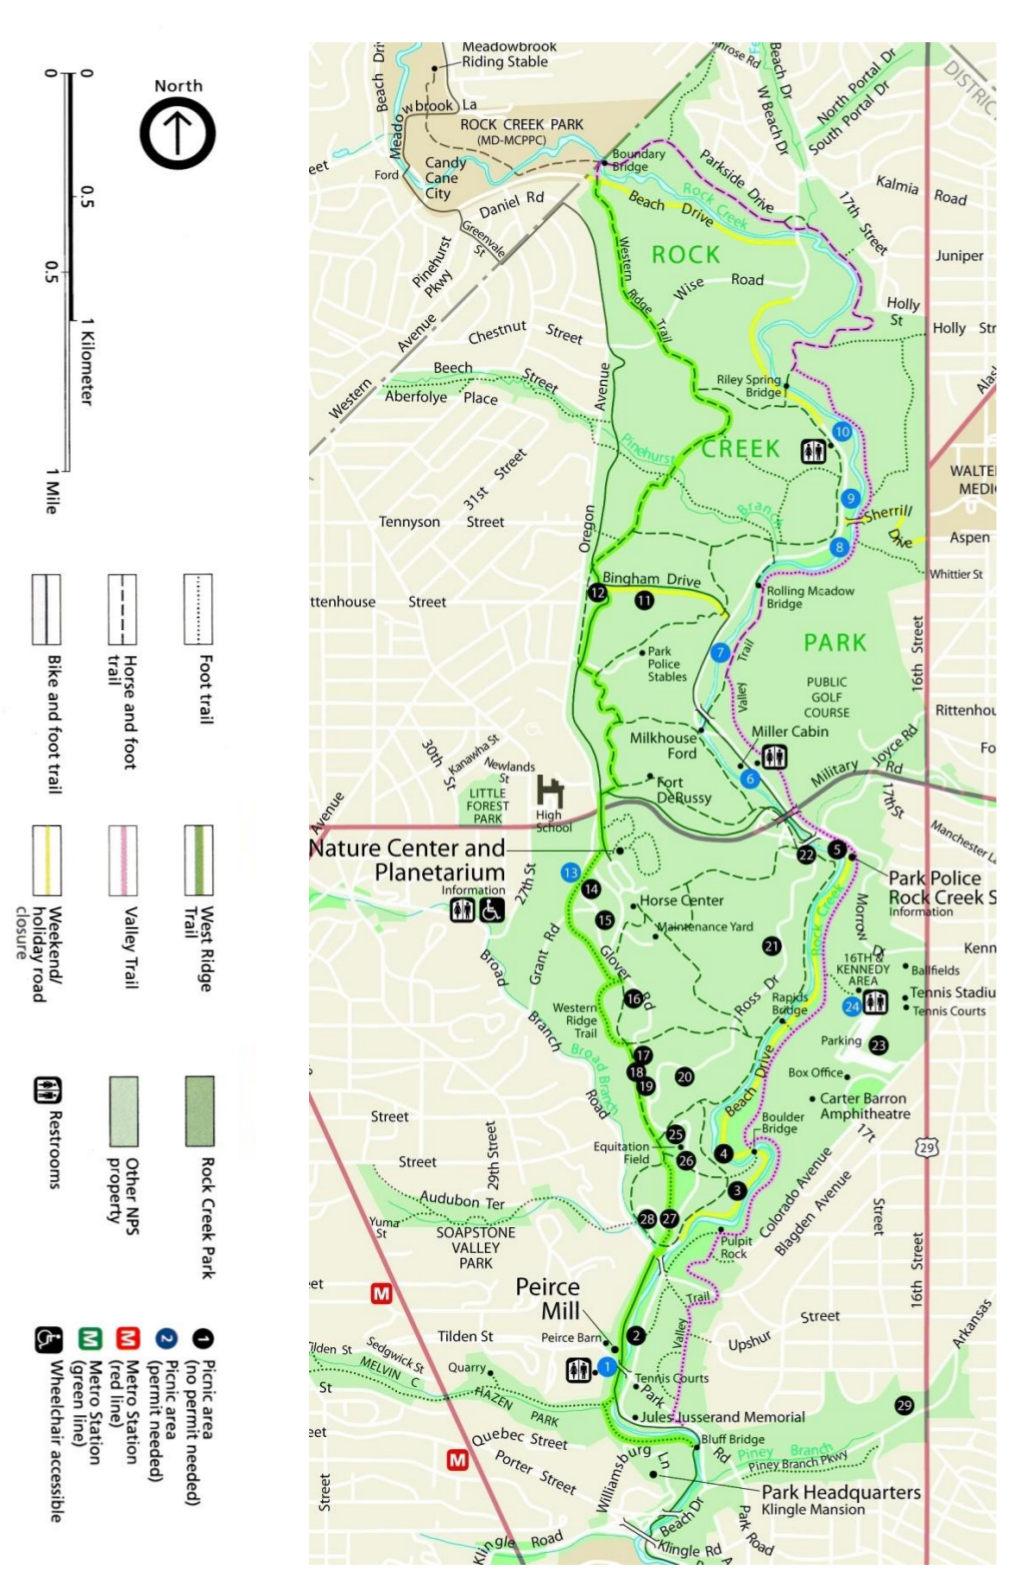 FileNPS Rockcreekbicyclemapjpg Wikimedia Commons - Boulder bike path map